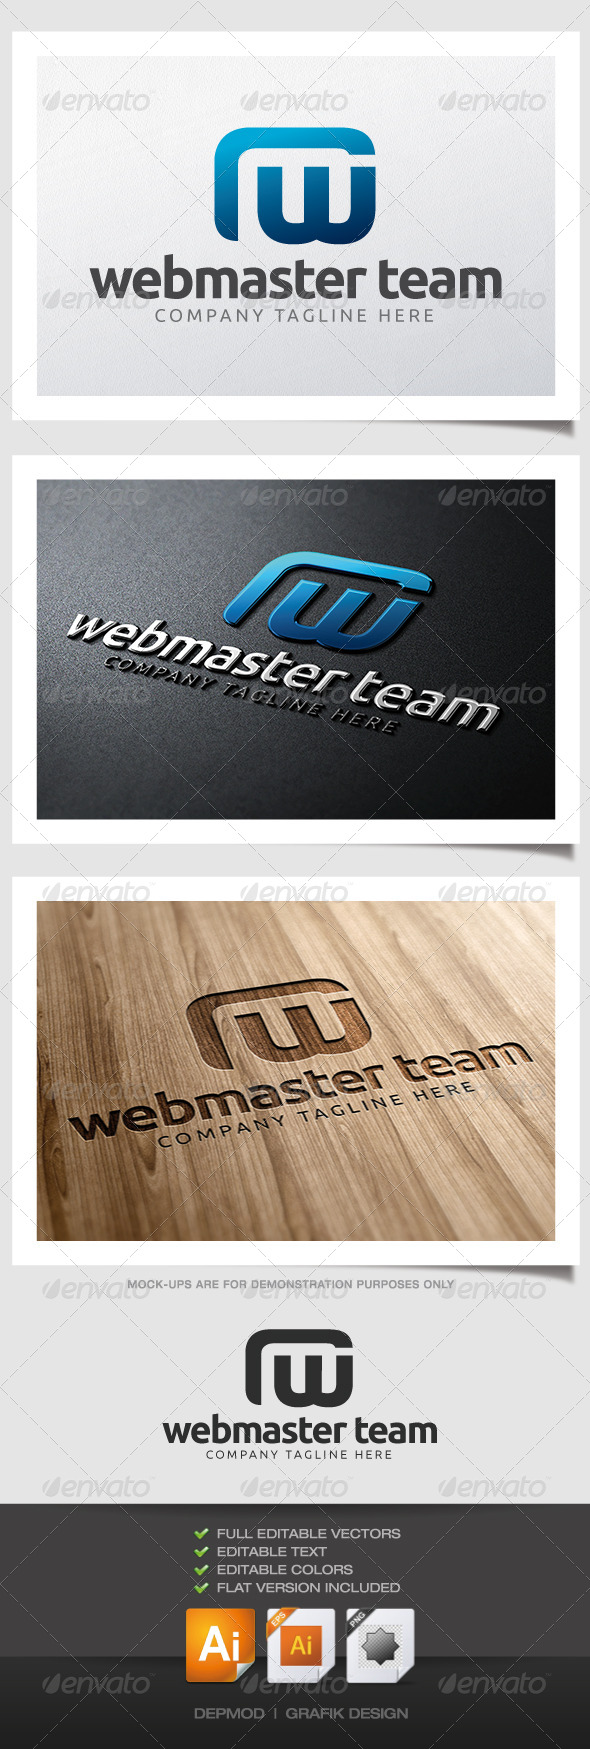 Webmaster Team Logo